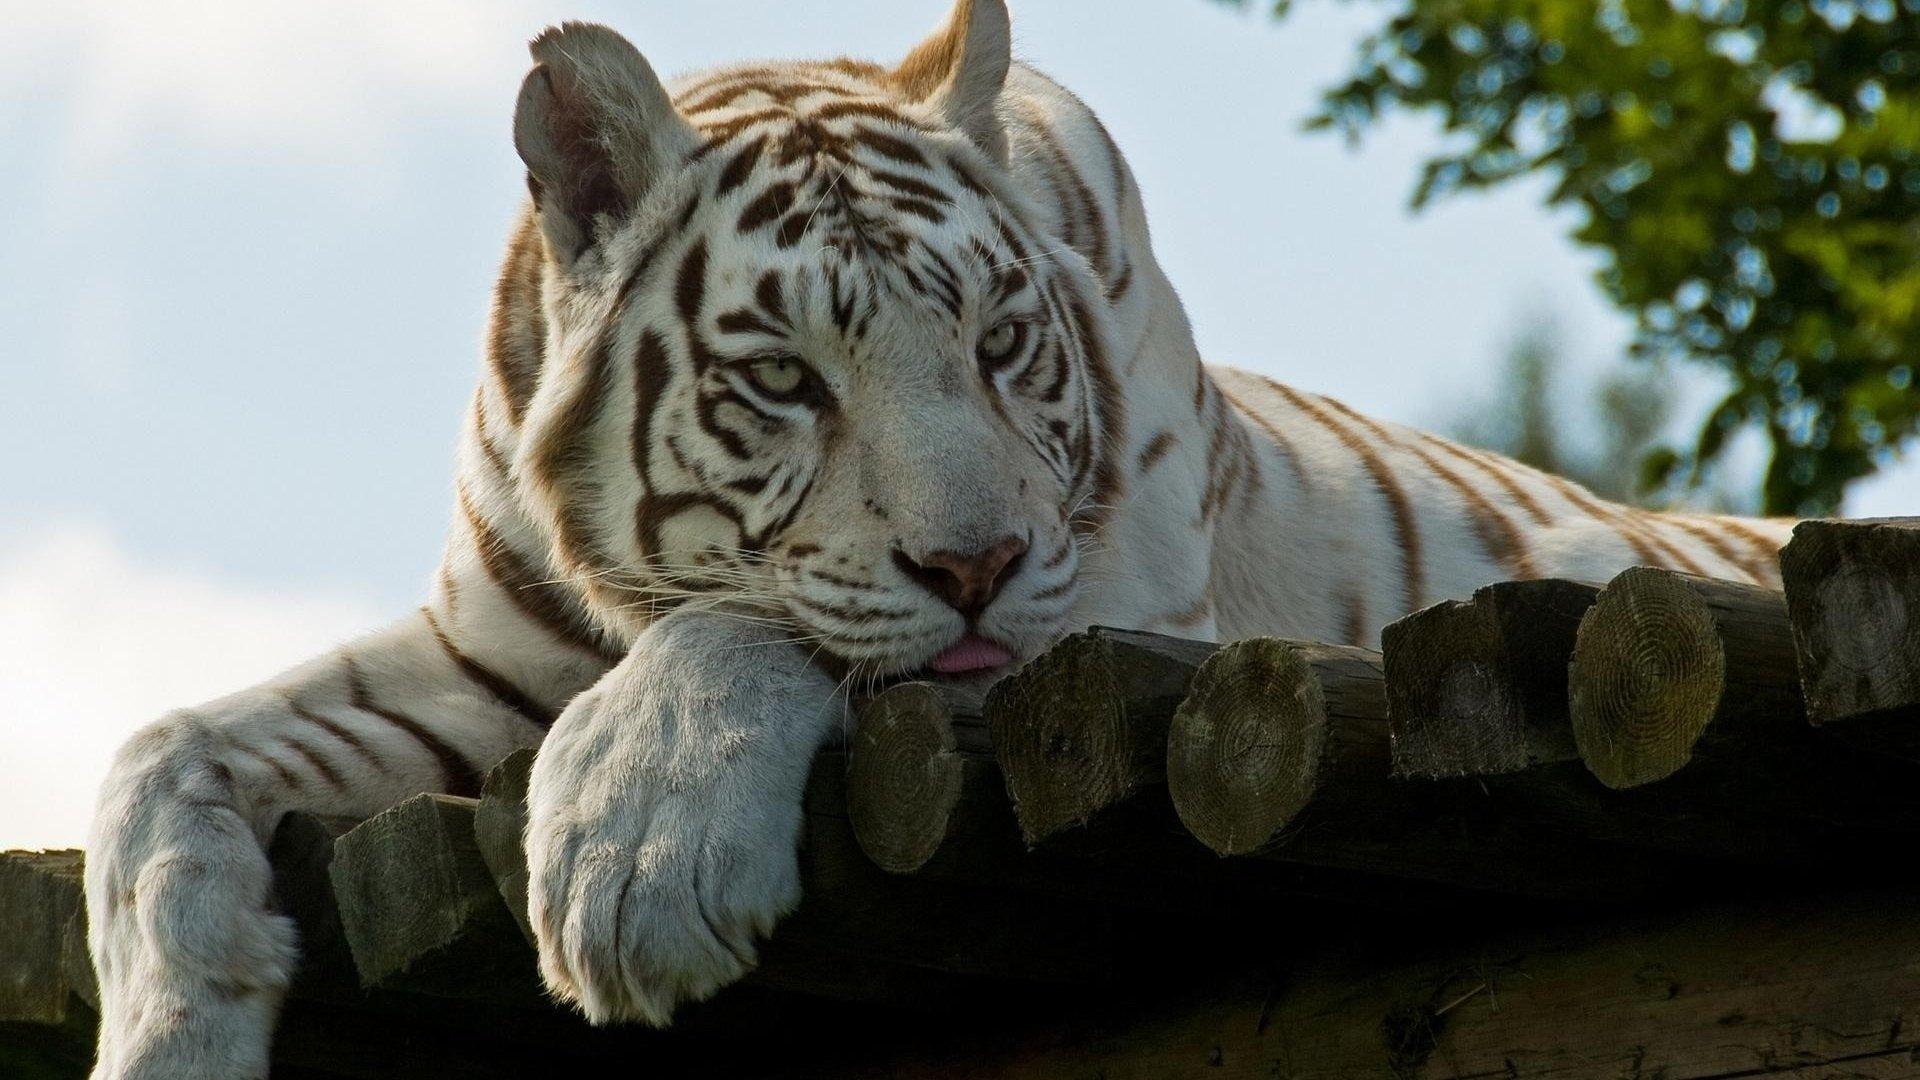 Animals-tigers-white-tiger-wood-panels-1920x1080-wallpaper-wp3402430